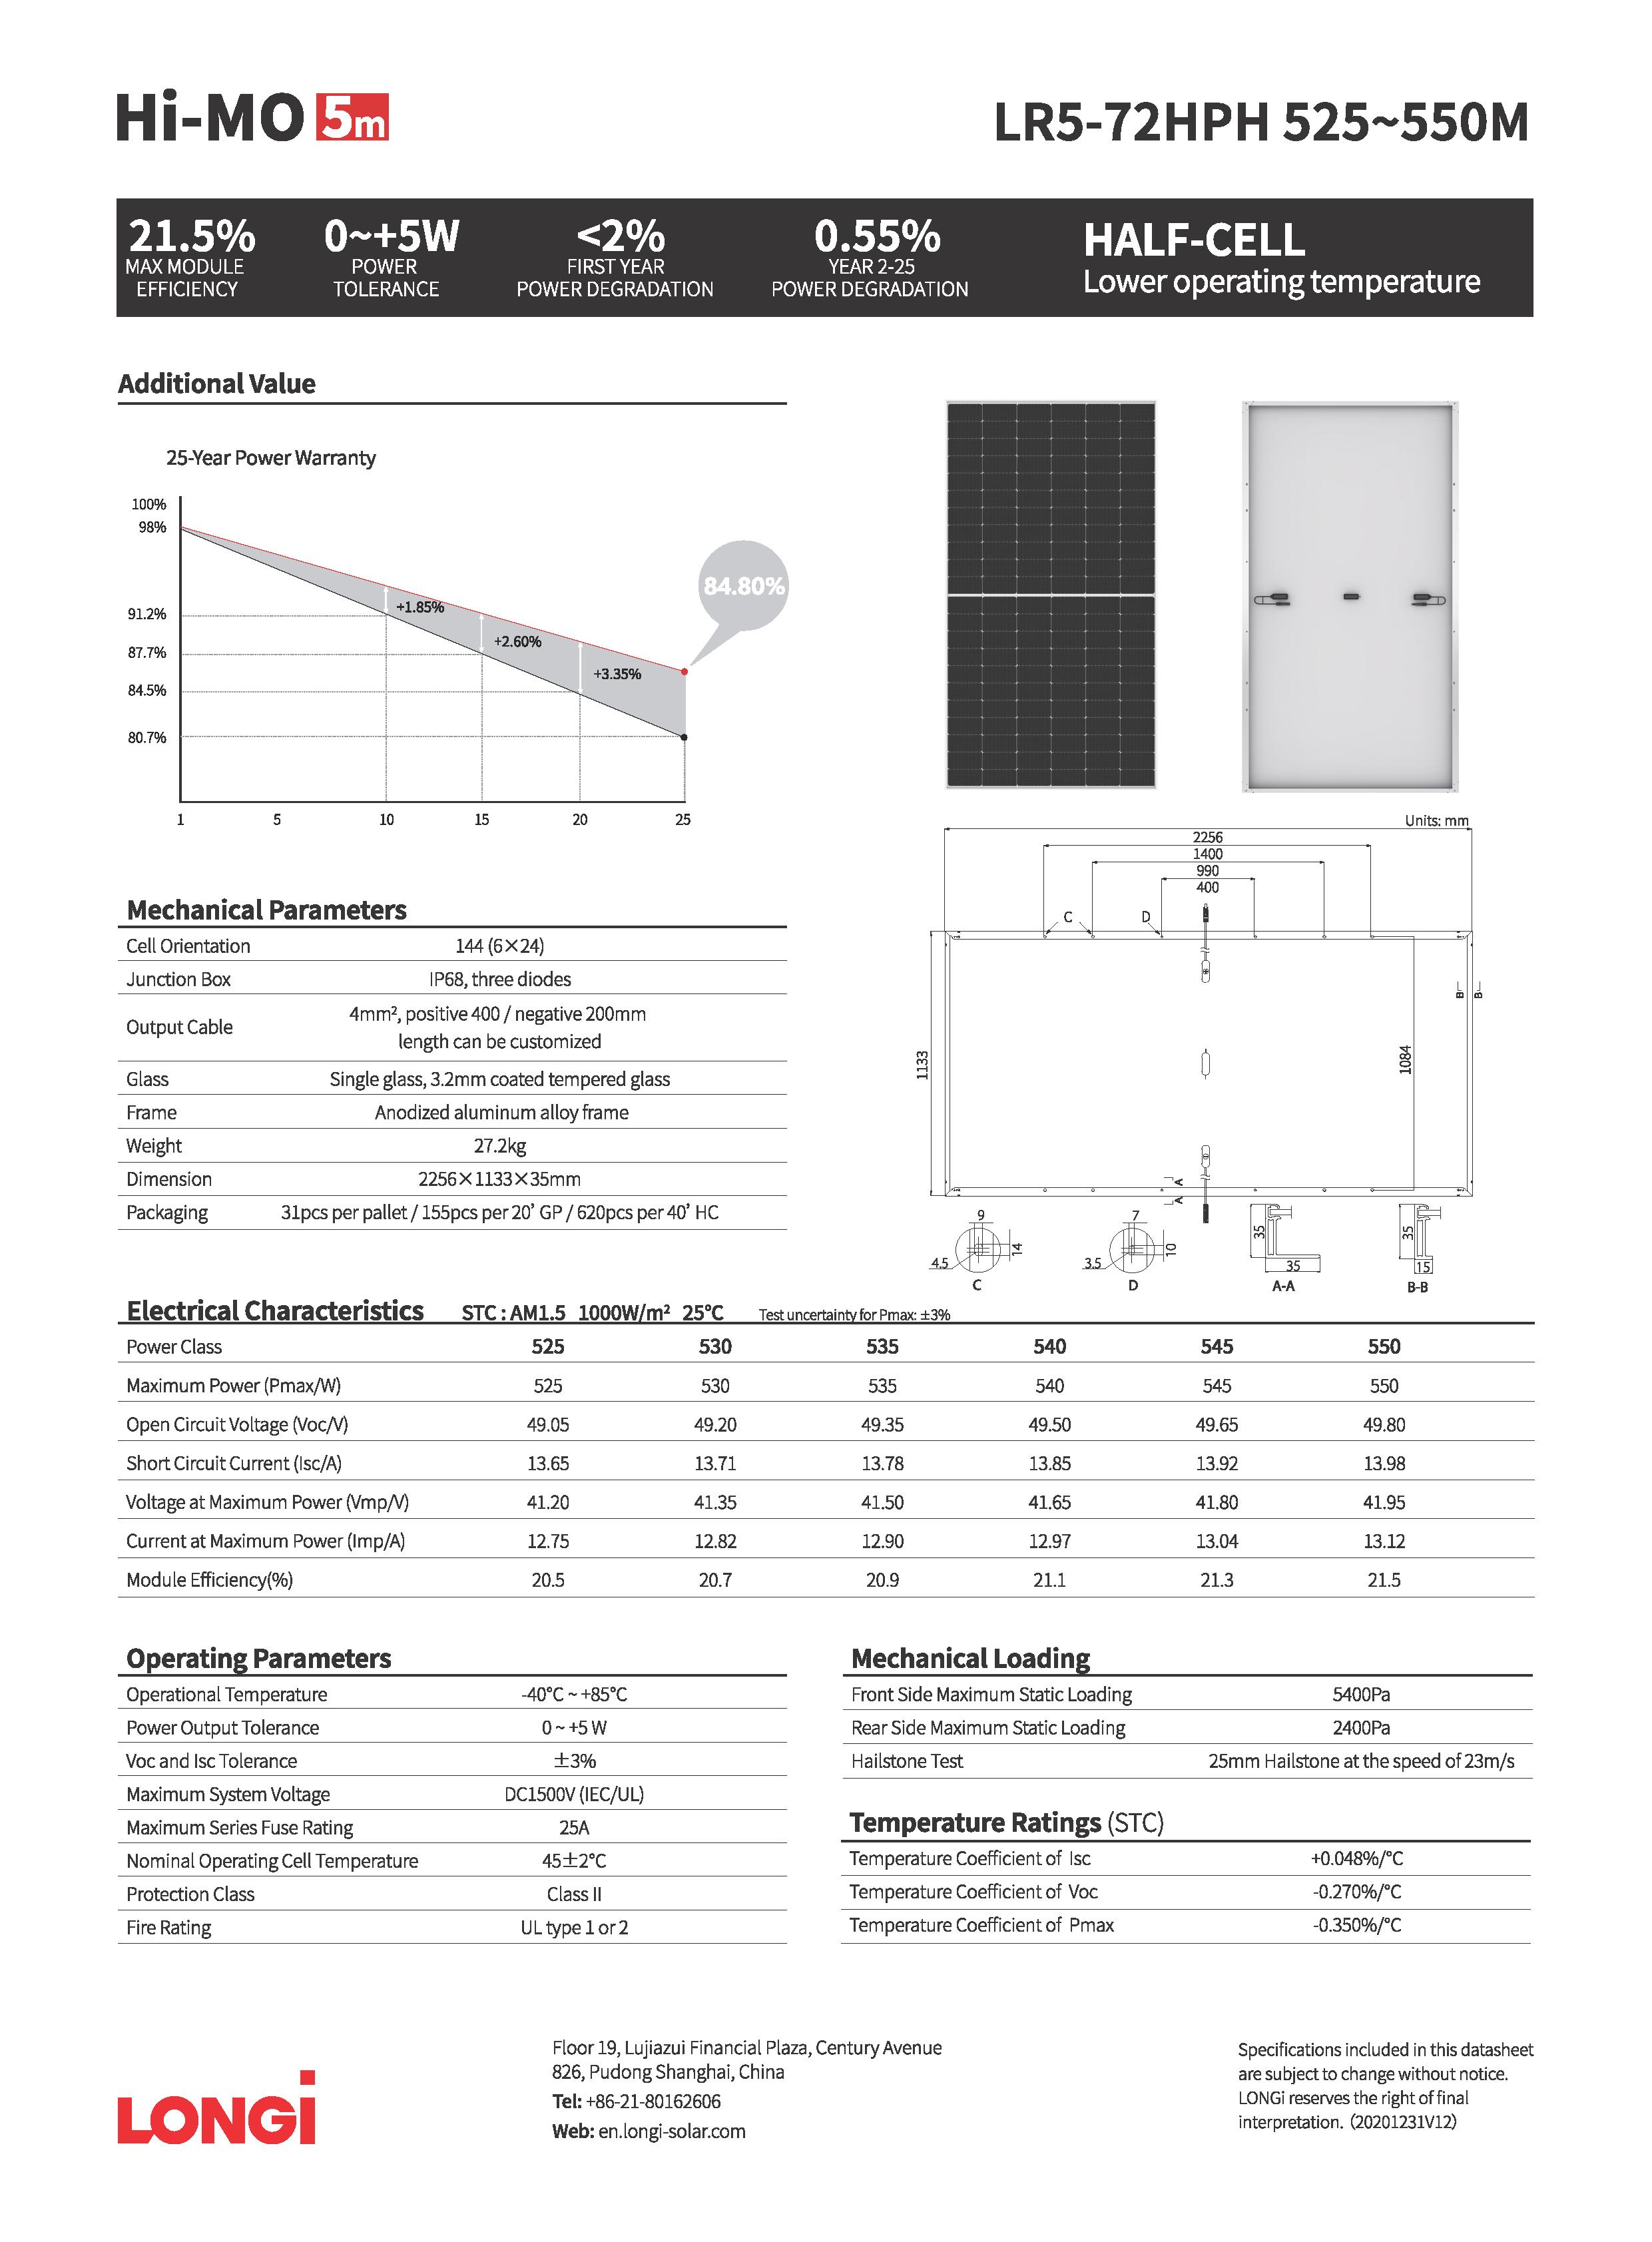 http://solarcellcenter.com/img/cms/LONGi Solar Mono PV/LR5-72HPH 525-550M data sheet_Page_2.png